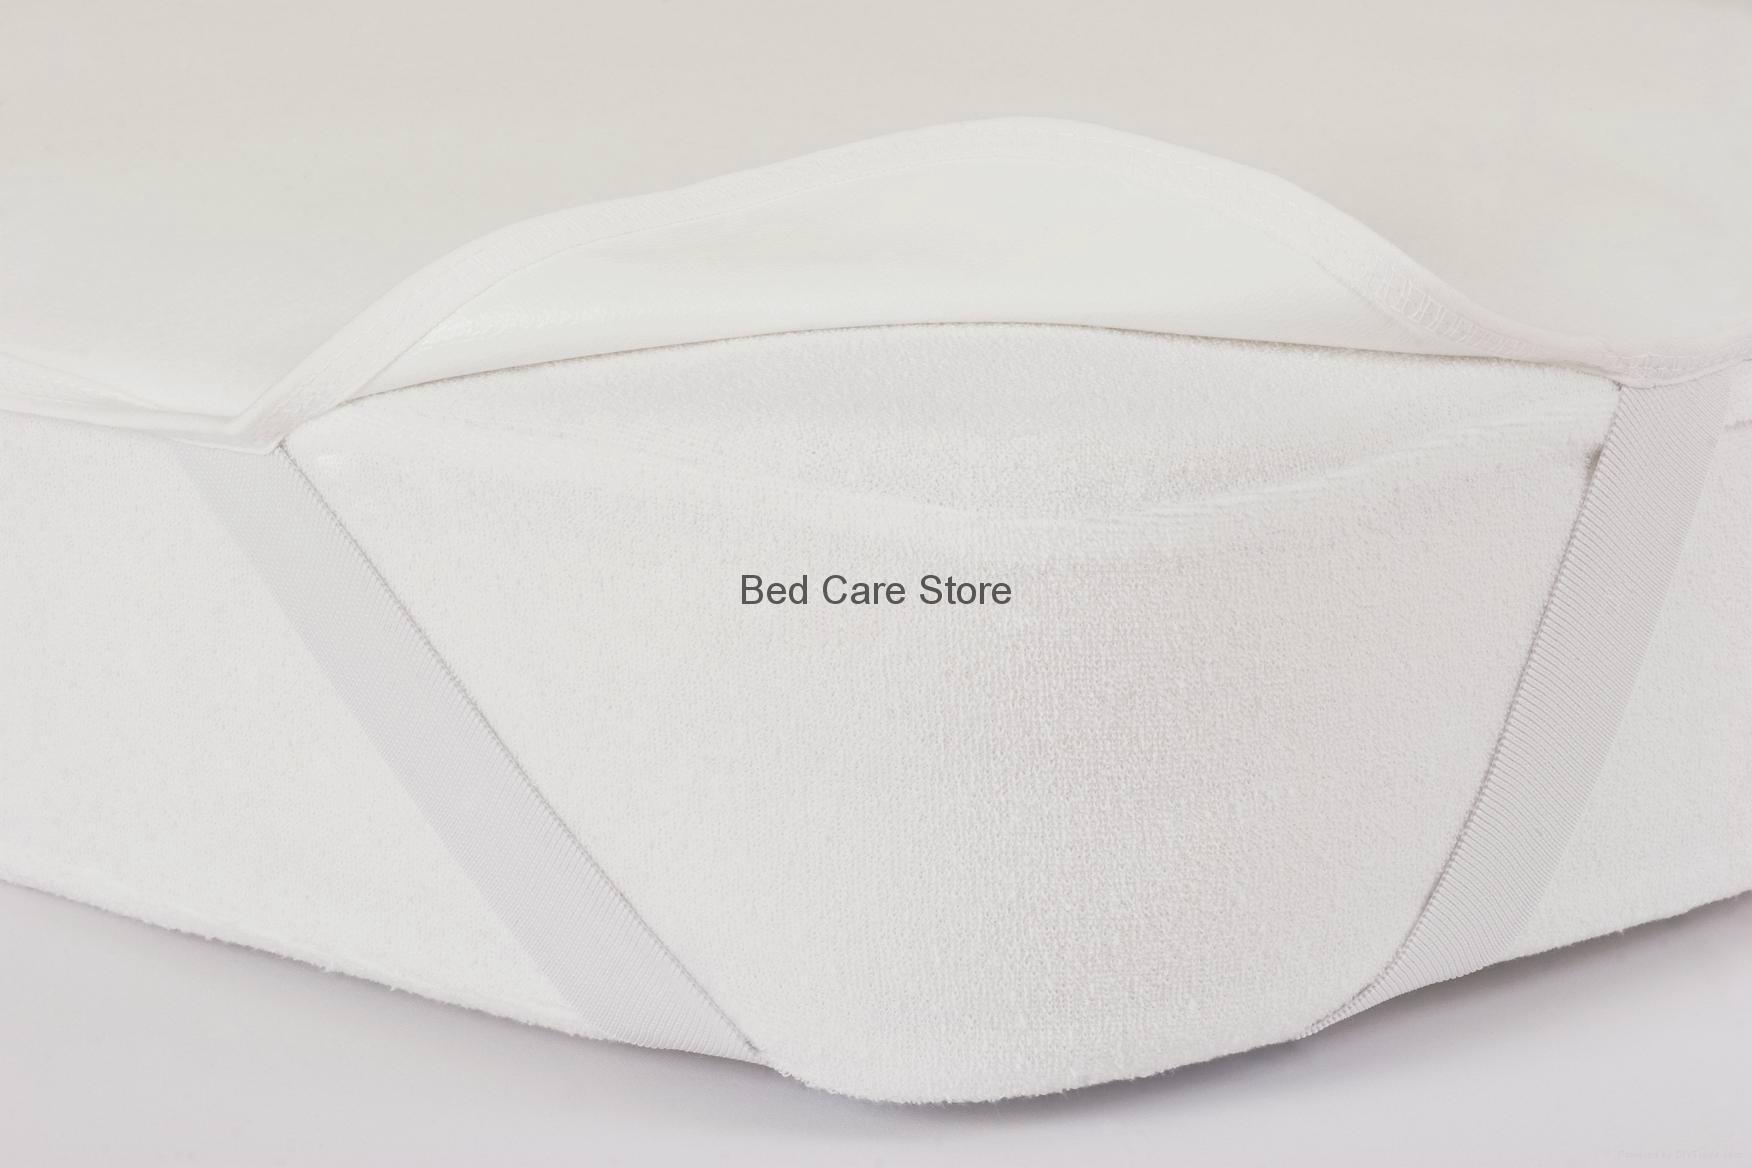 %100 Cotton Waterproof Flannel Mattress Protector 2